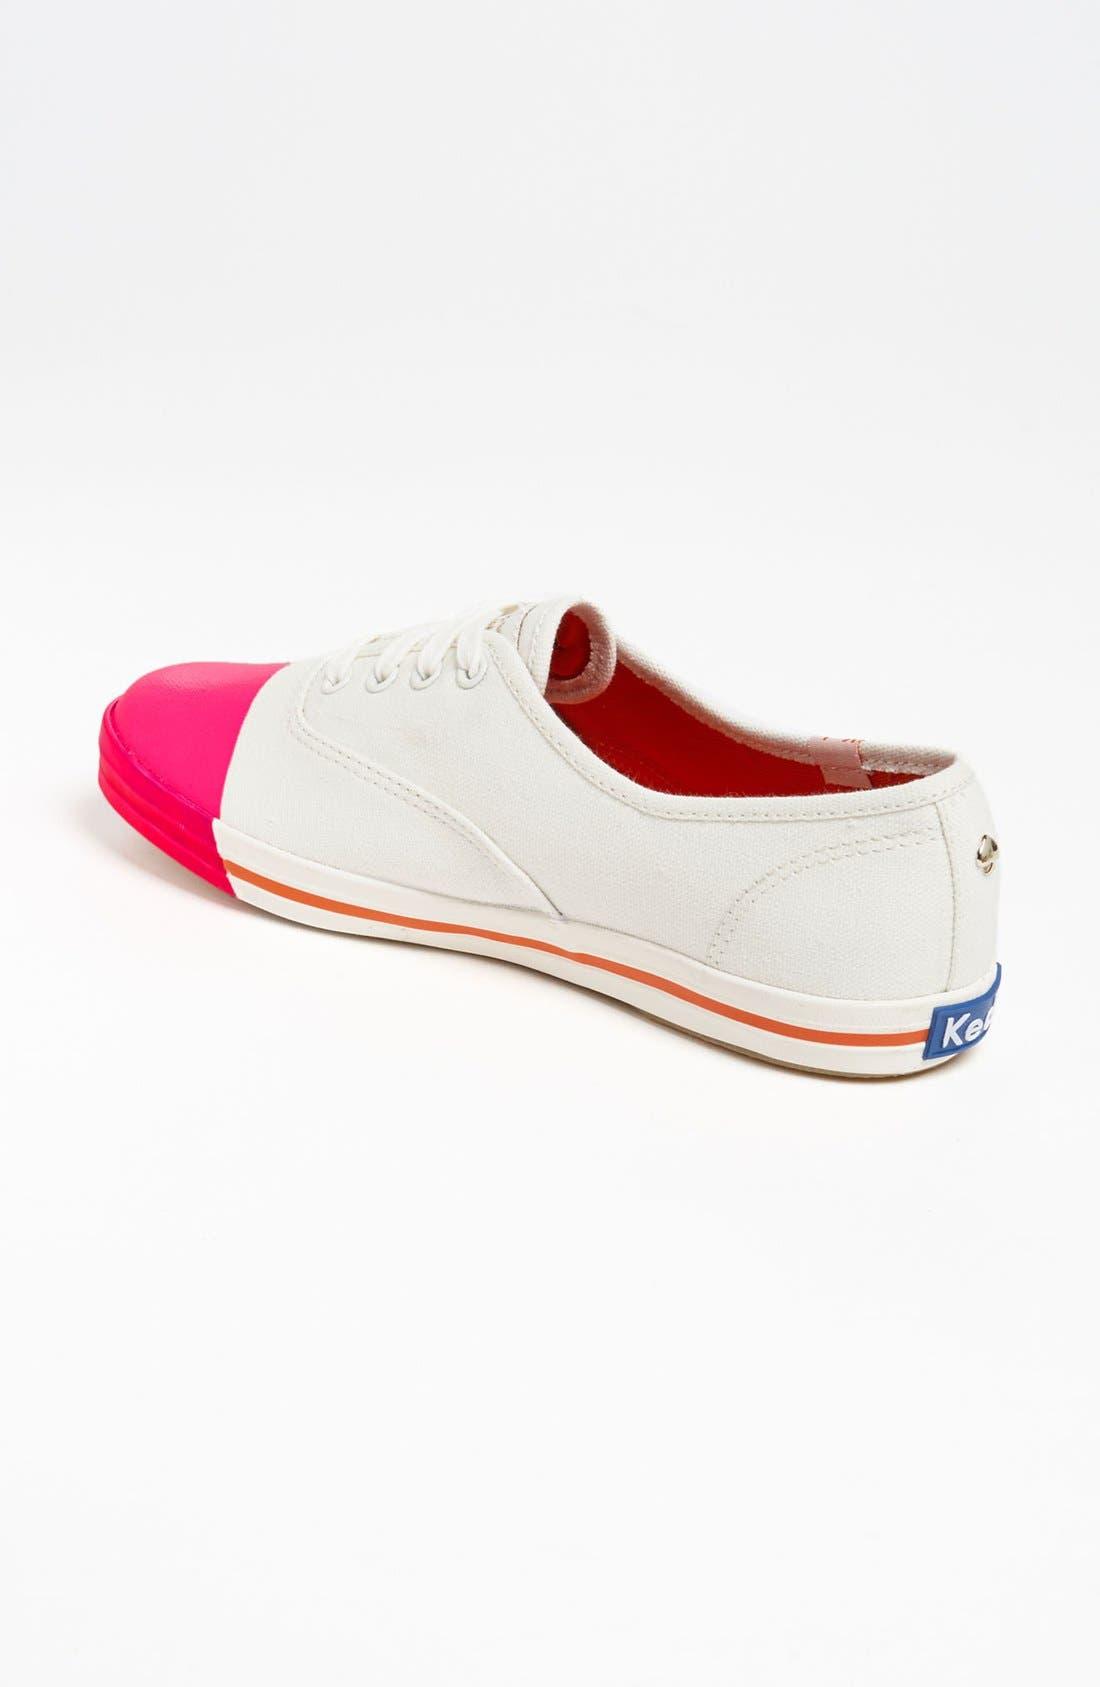 Keds<sup>®</sup> for kate spade new york 'kick' sneaker,                             Alternate thumbnail 7, color,